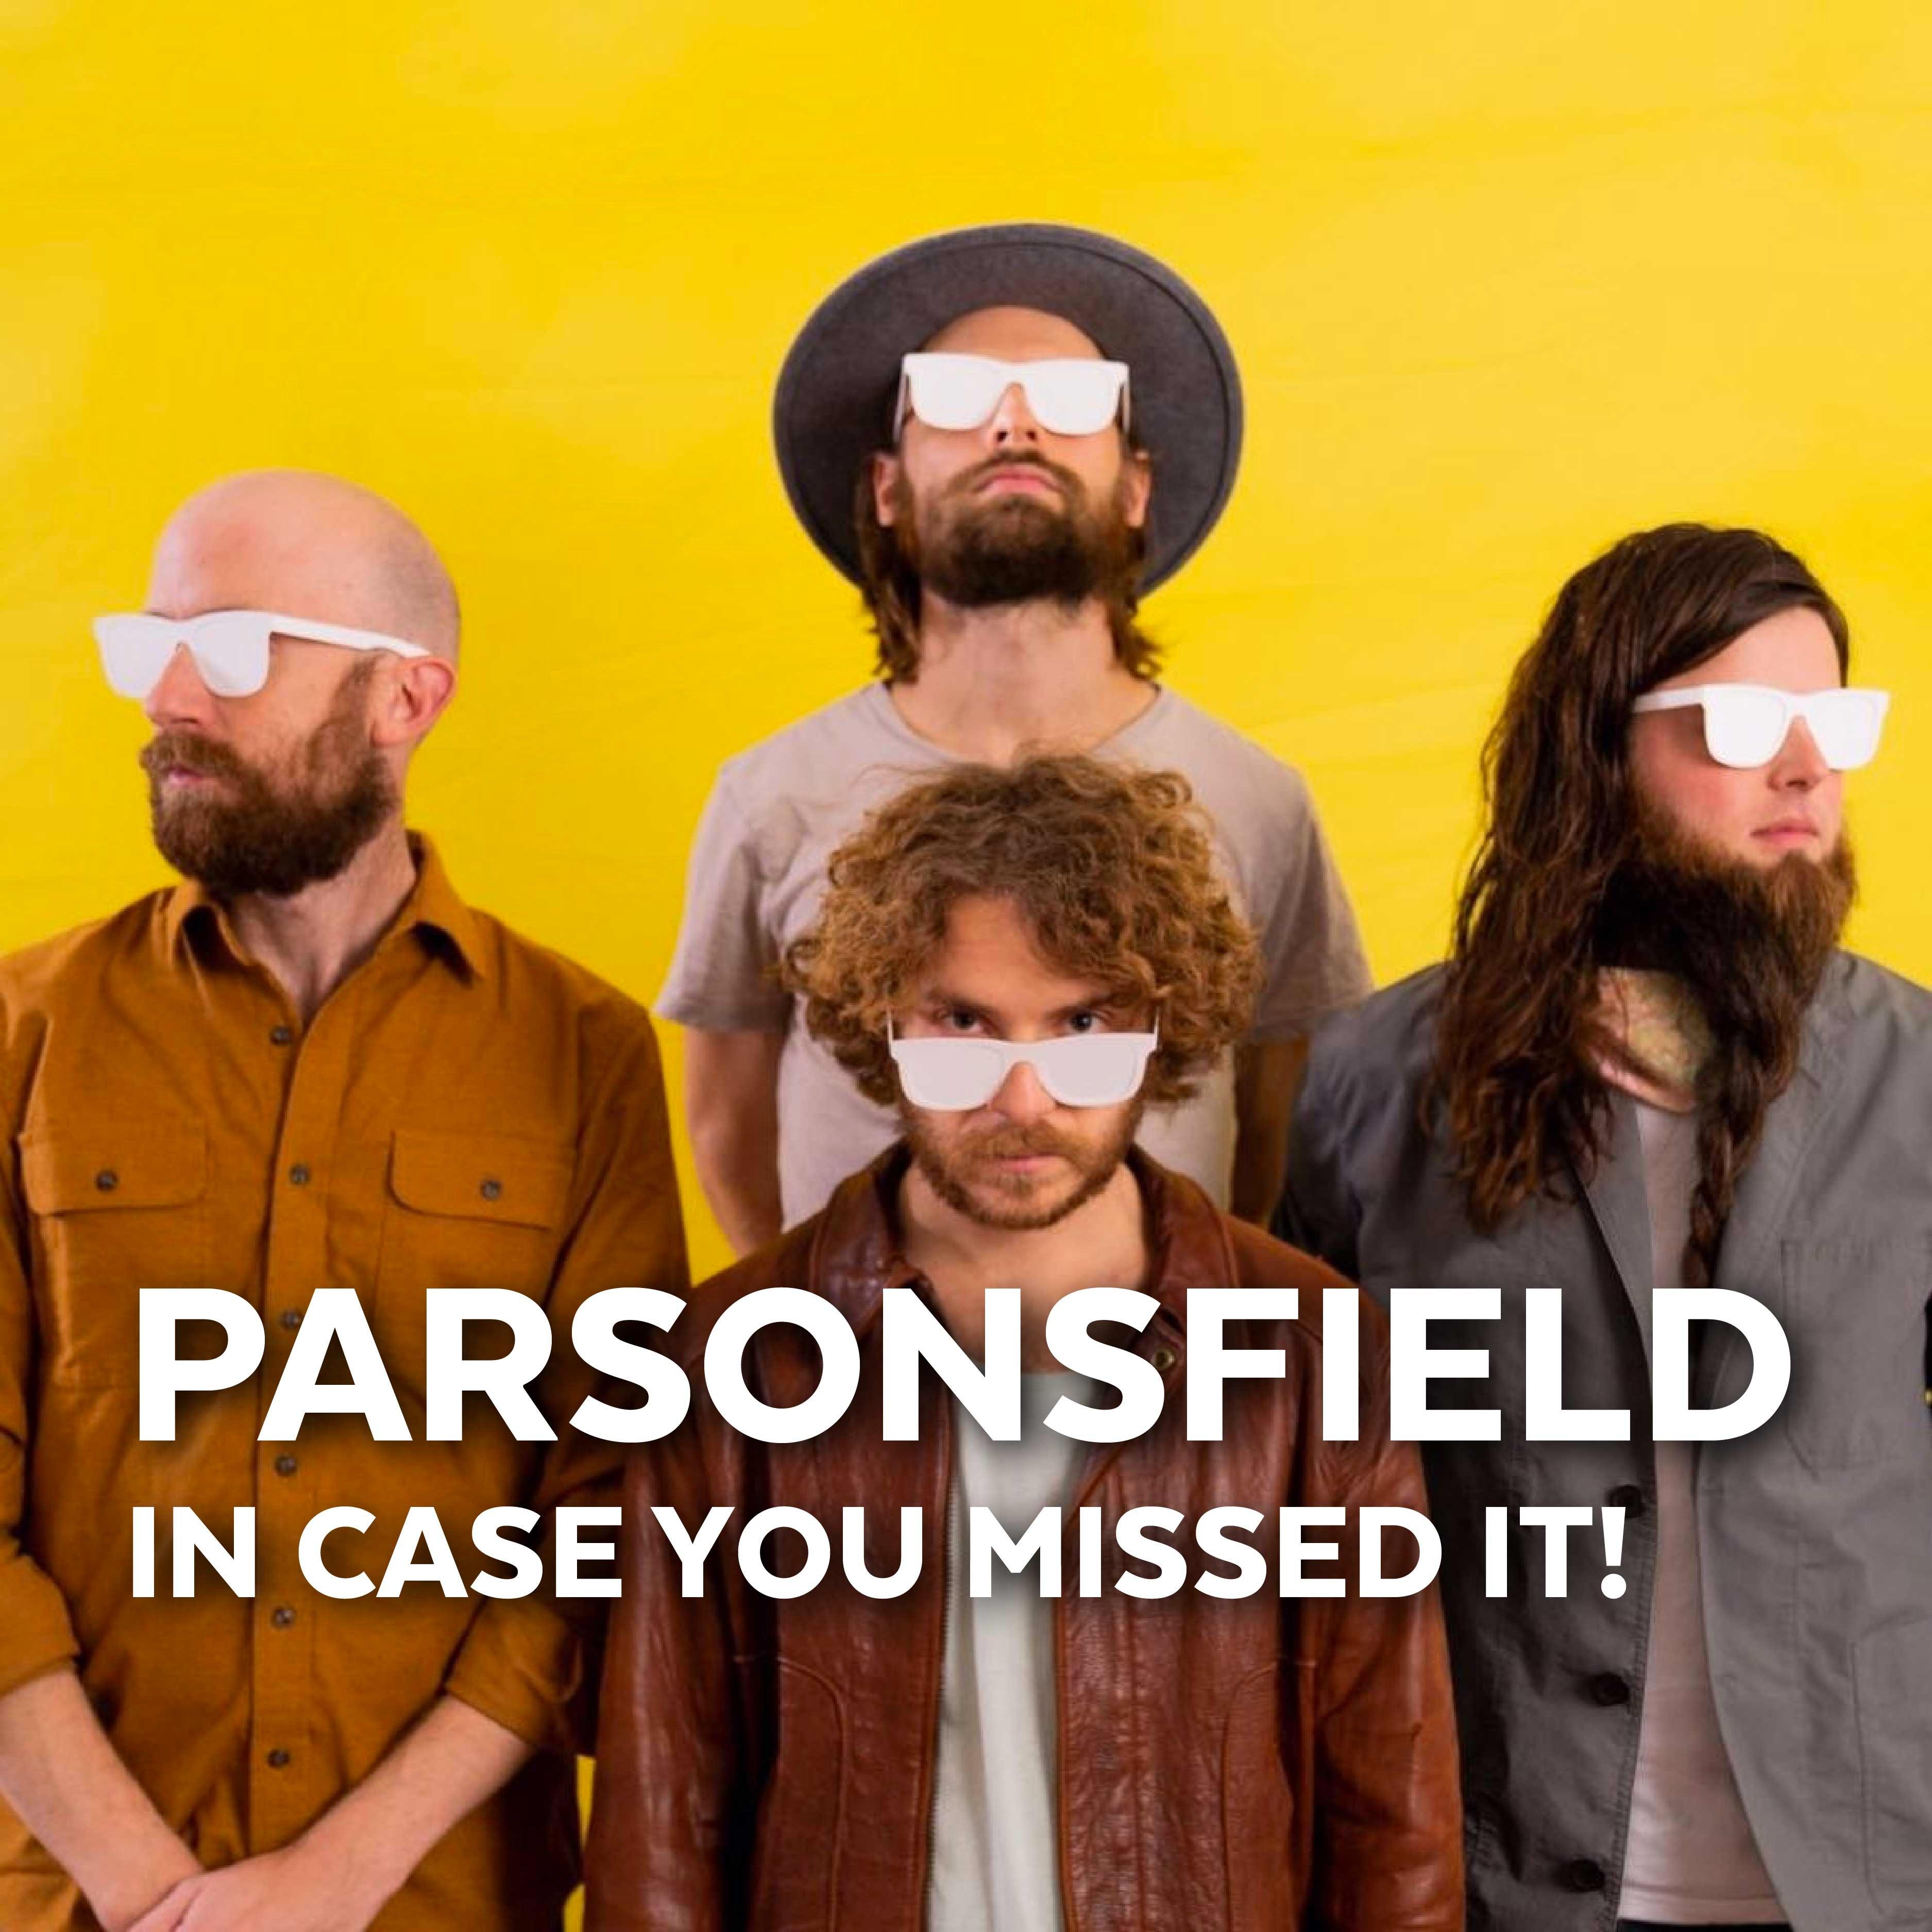 parsonsfield-01.jpg